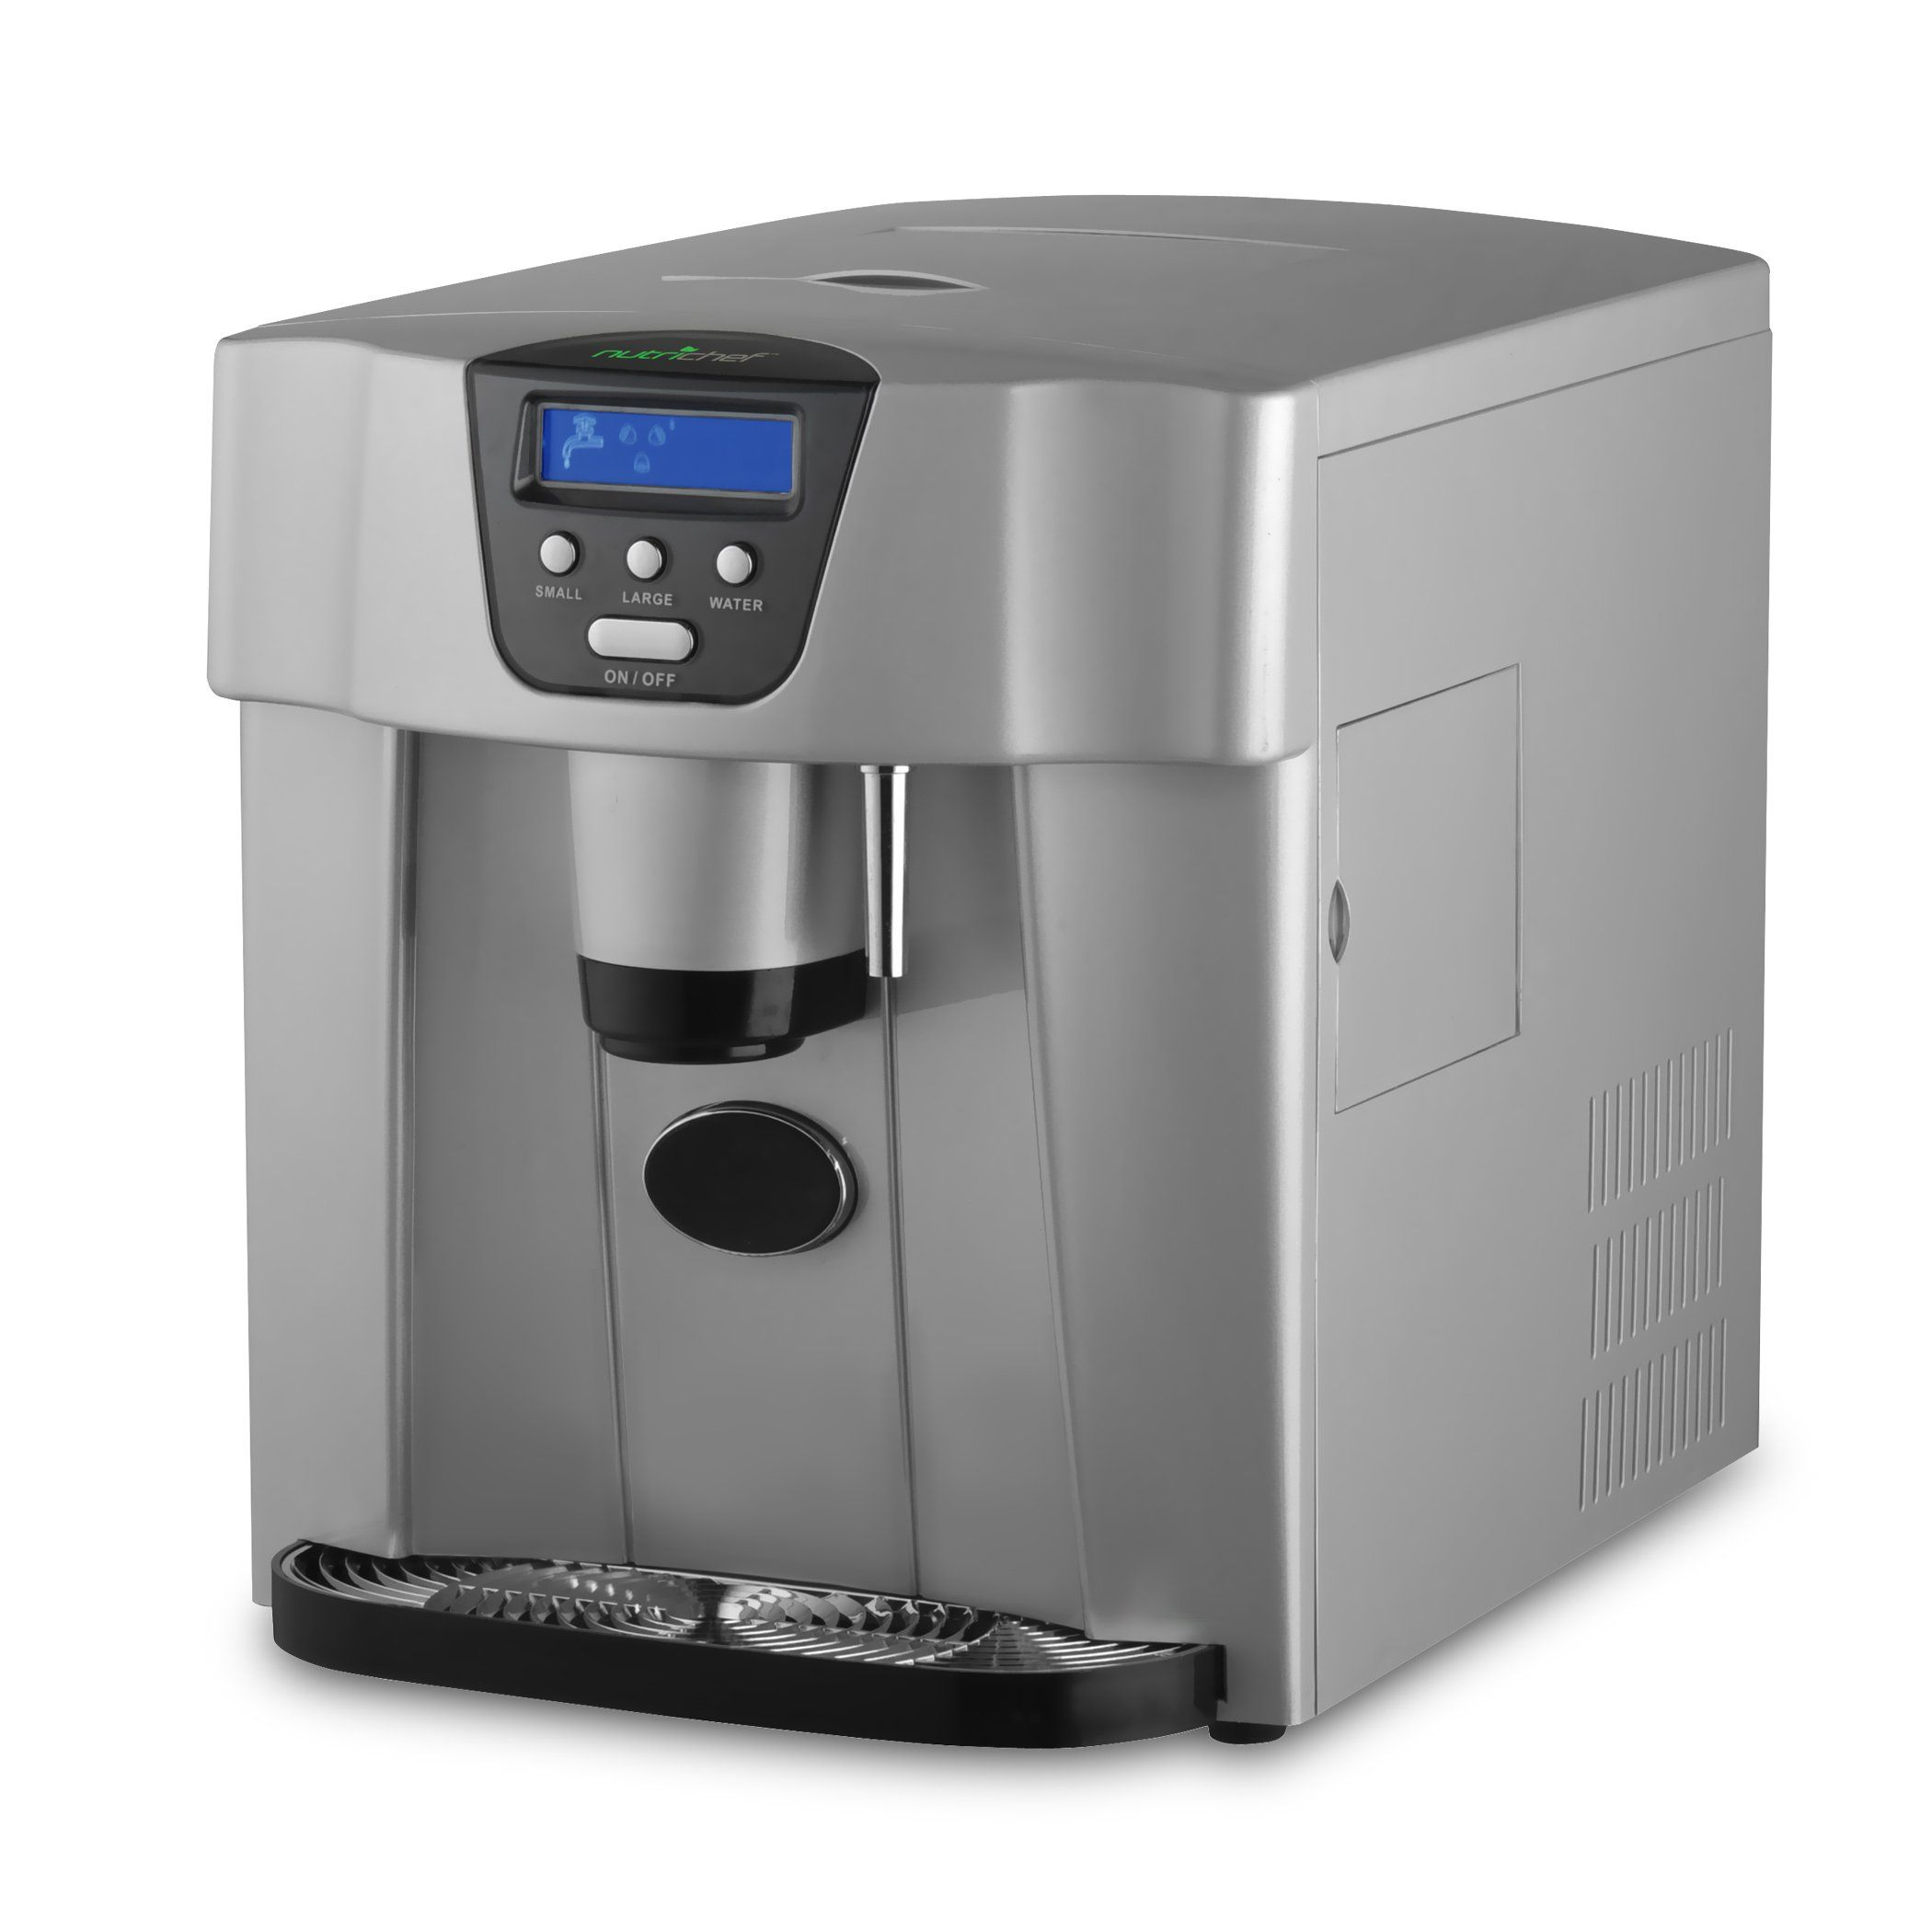 Nutrichef Picem750 Stainless Steel Ice Maker Dispenser Ice